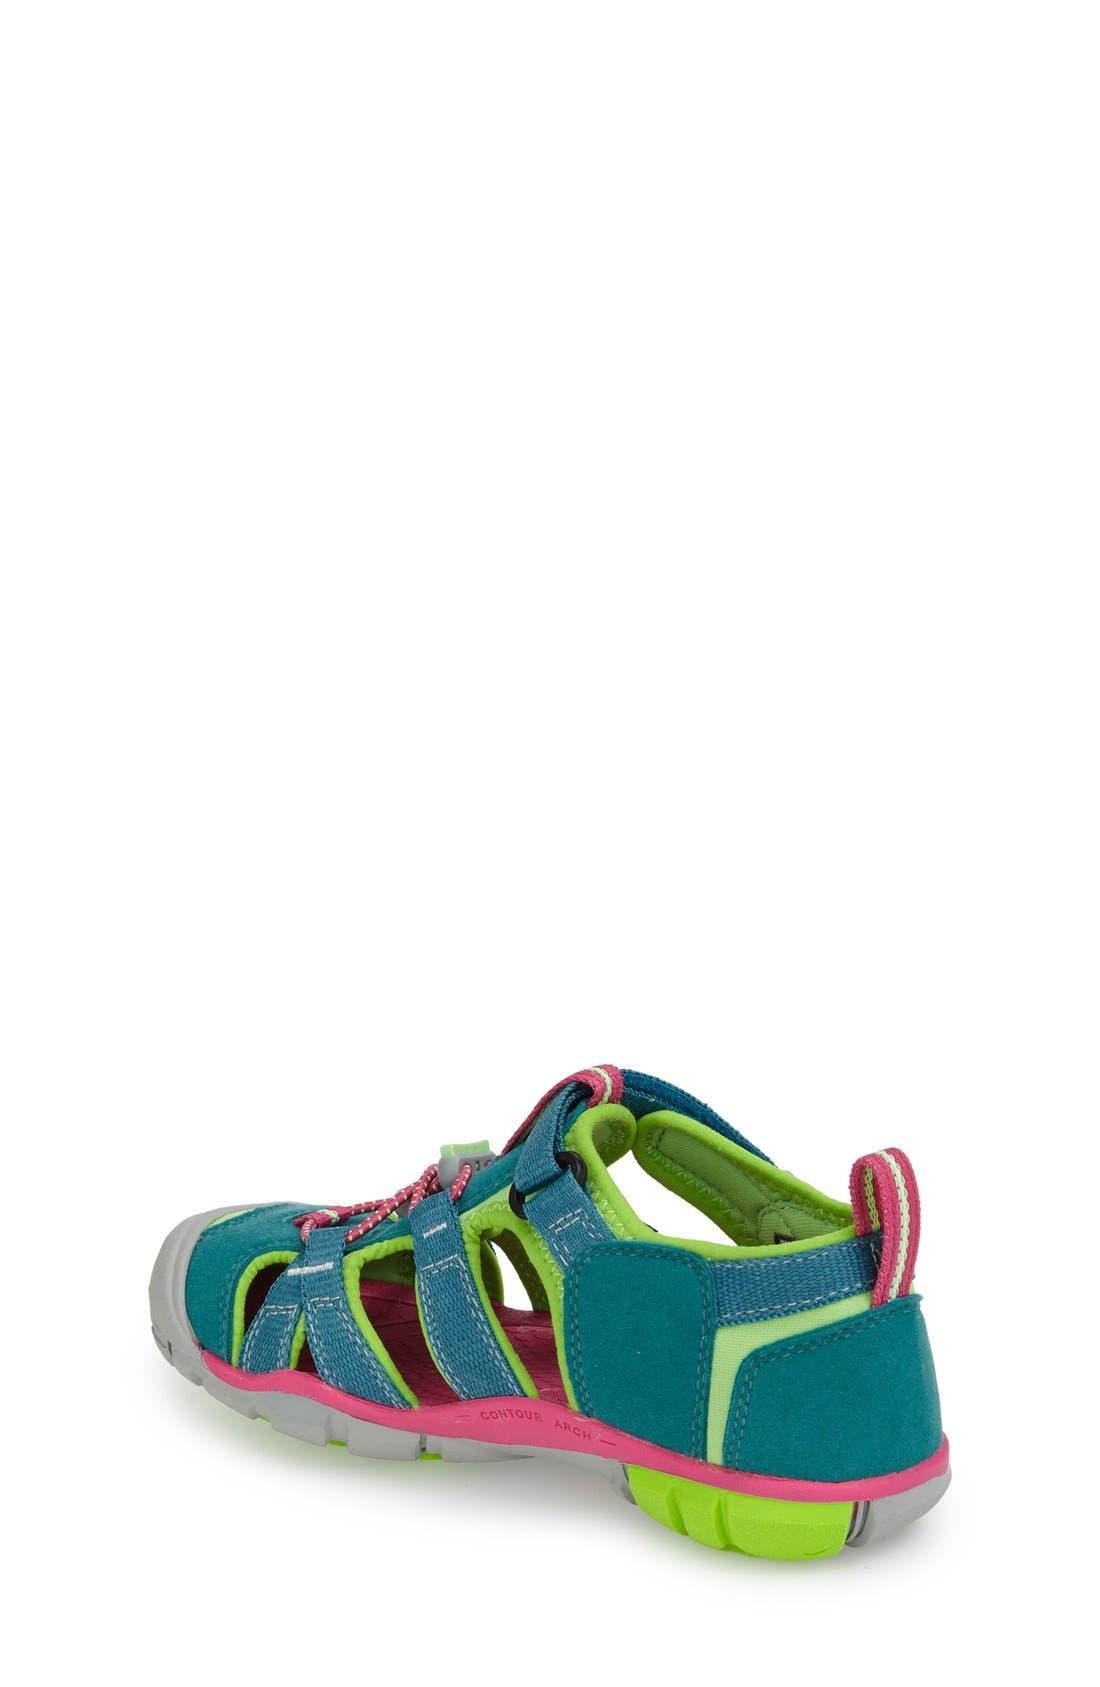 ,                             'Seacamp II' Water Friendly Sandal,                             Alternate thumbnail 129, color,                             300